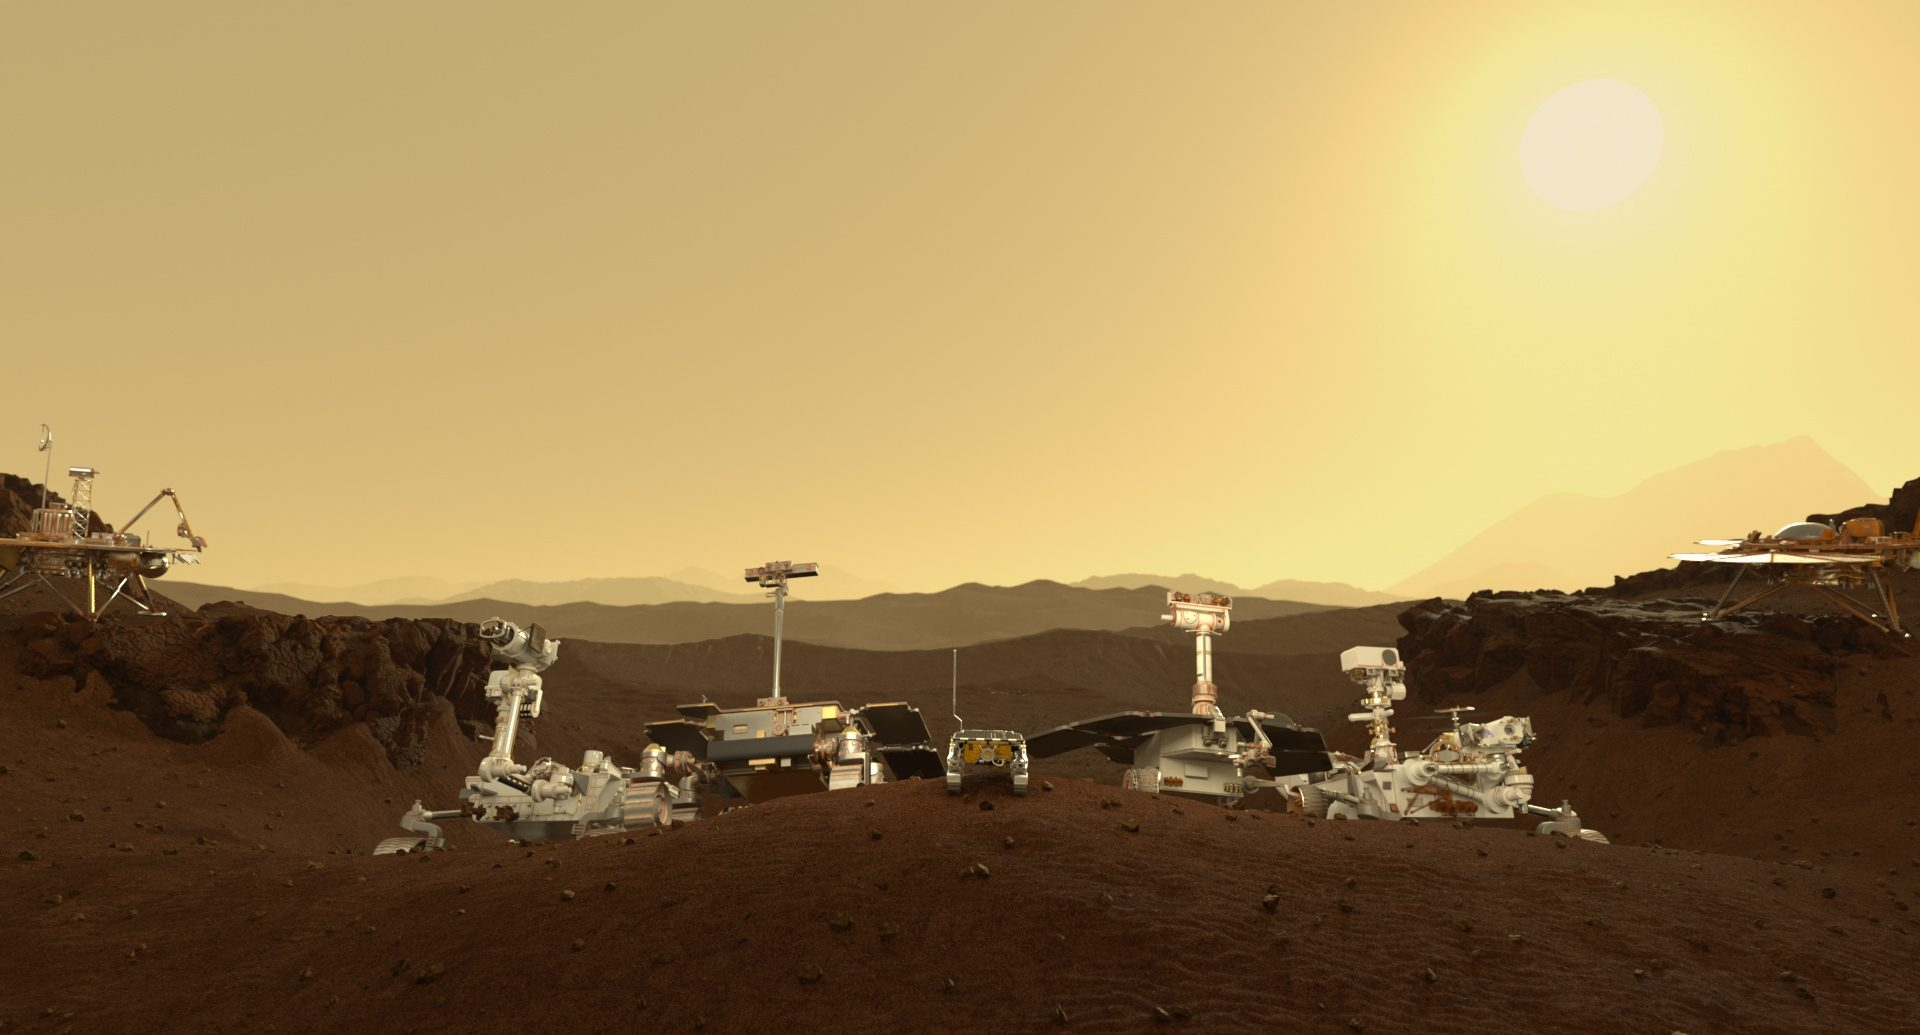 Maxon Mars - Rovers